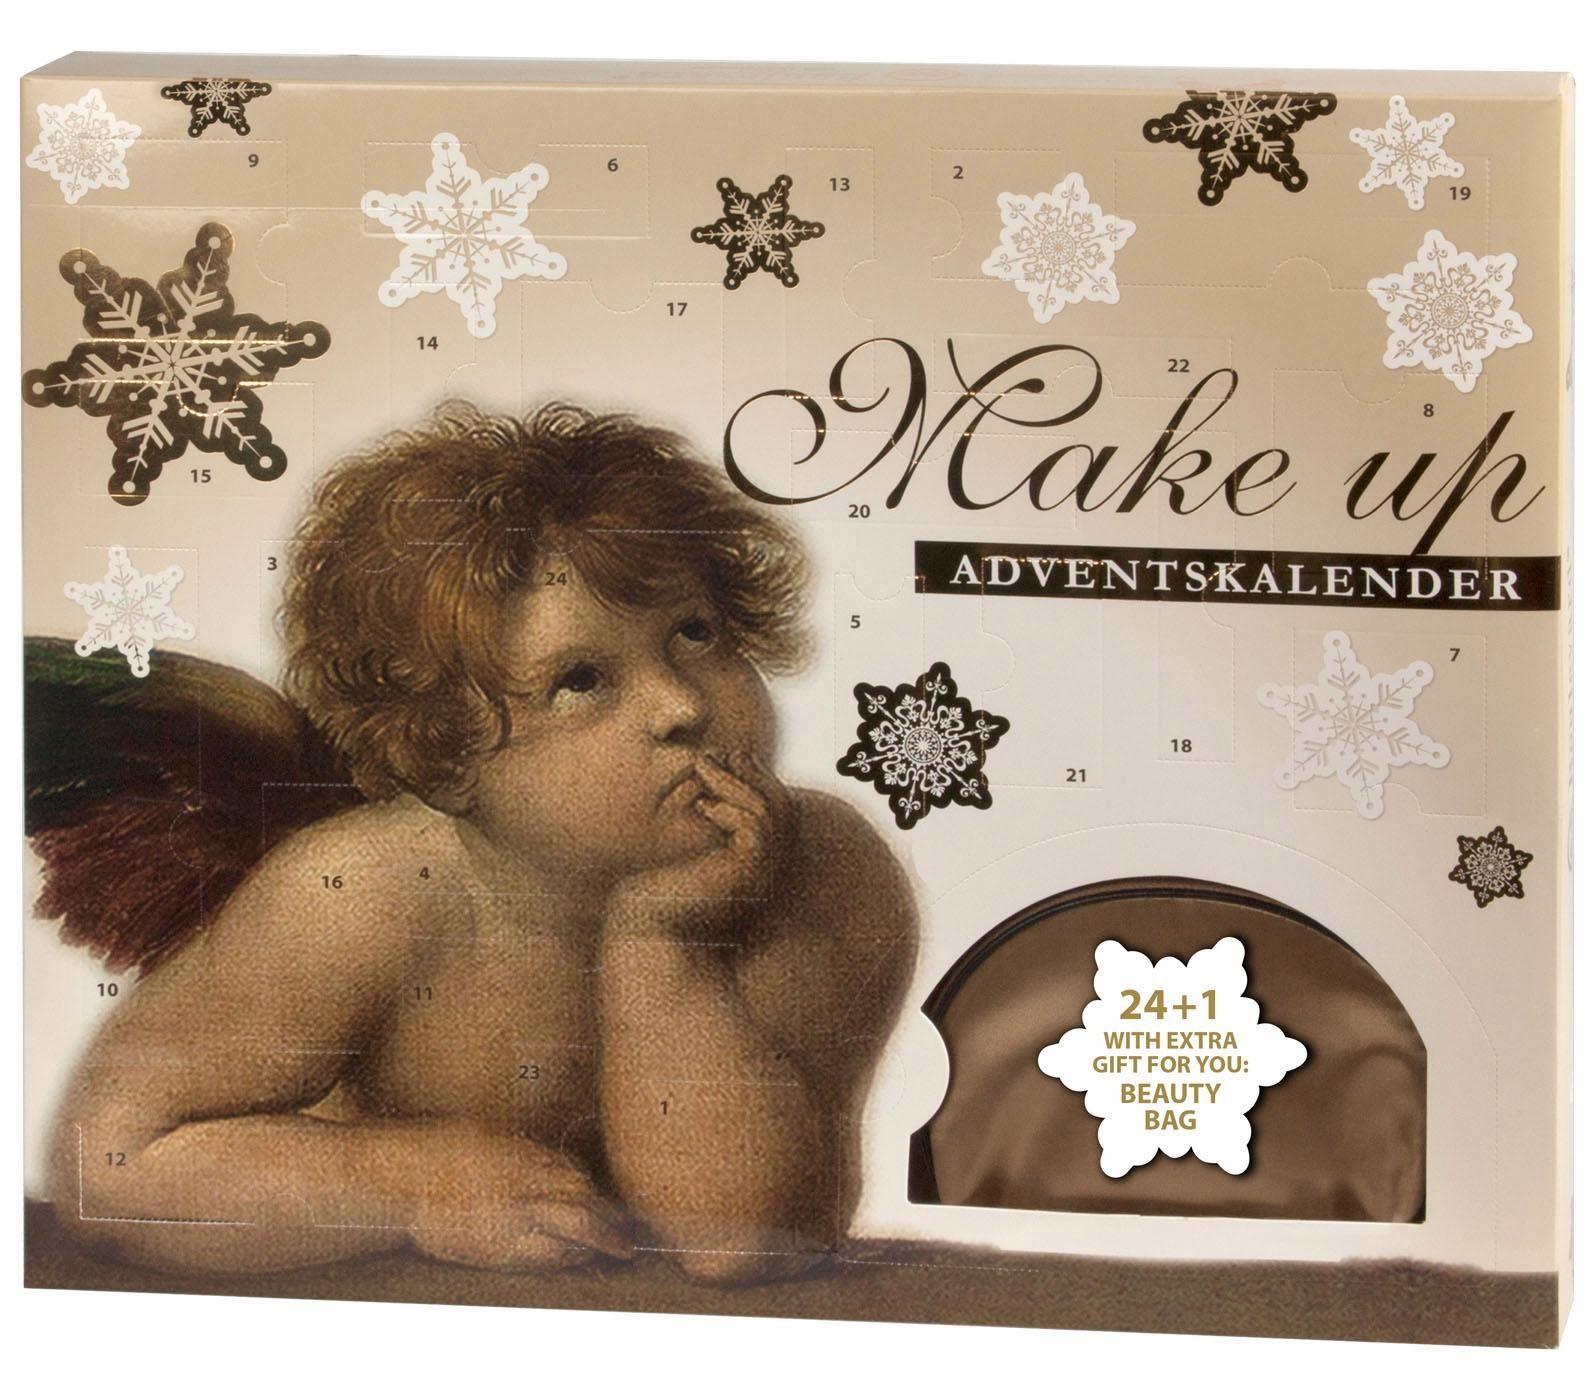 »Angelic Adventskalender«, Beauty-Adventskalender